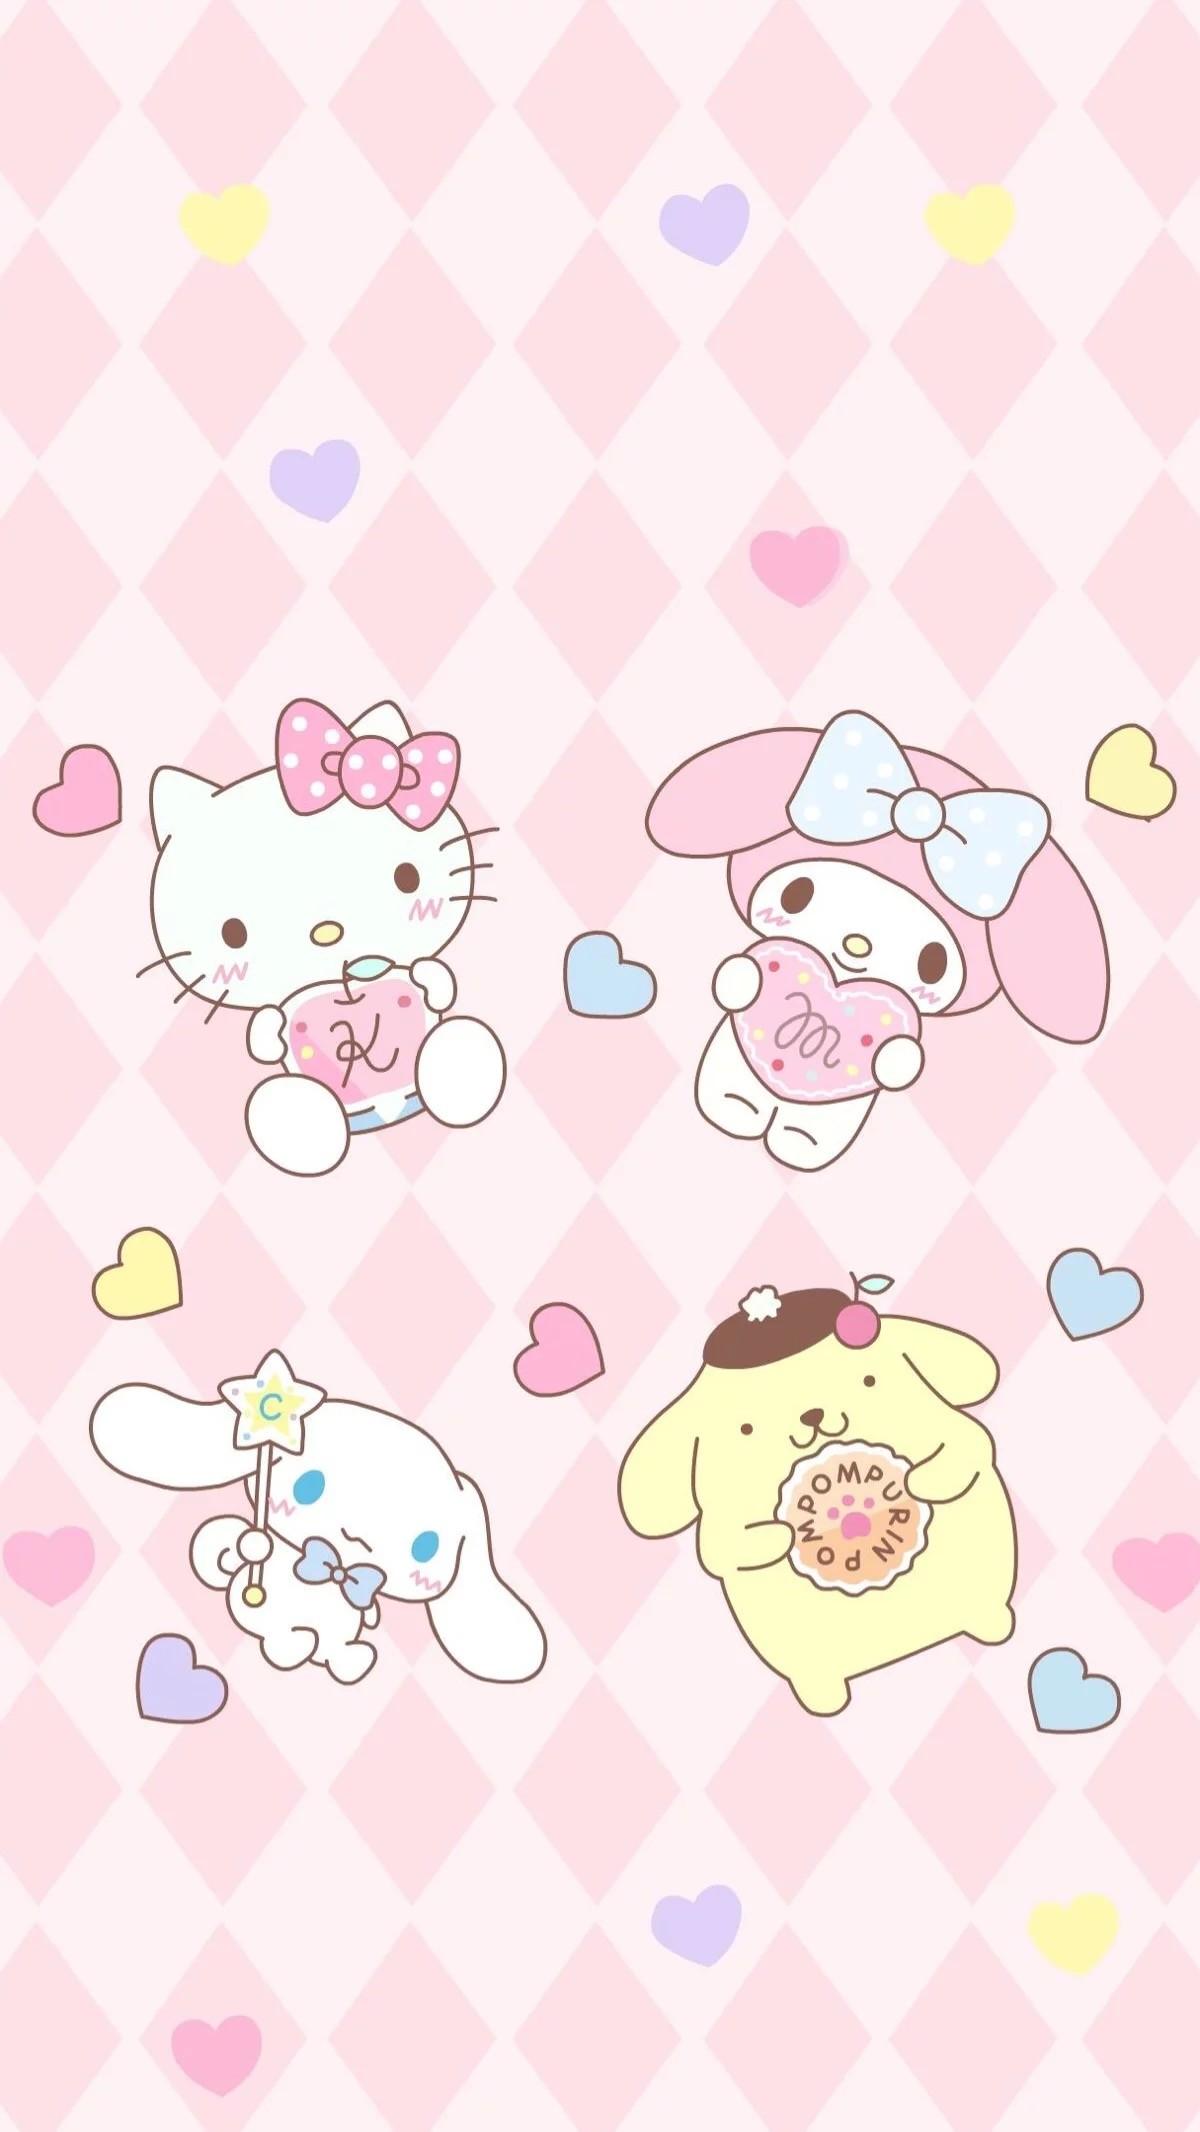 Sanrio Pom Pom Purin and Macaron Wallpaper ·① WallpaperTag